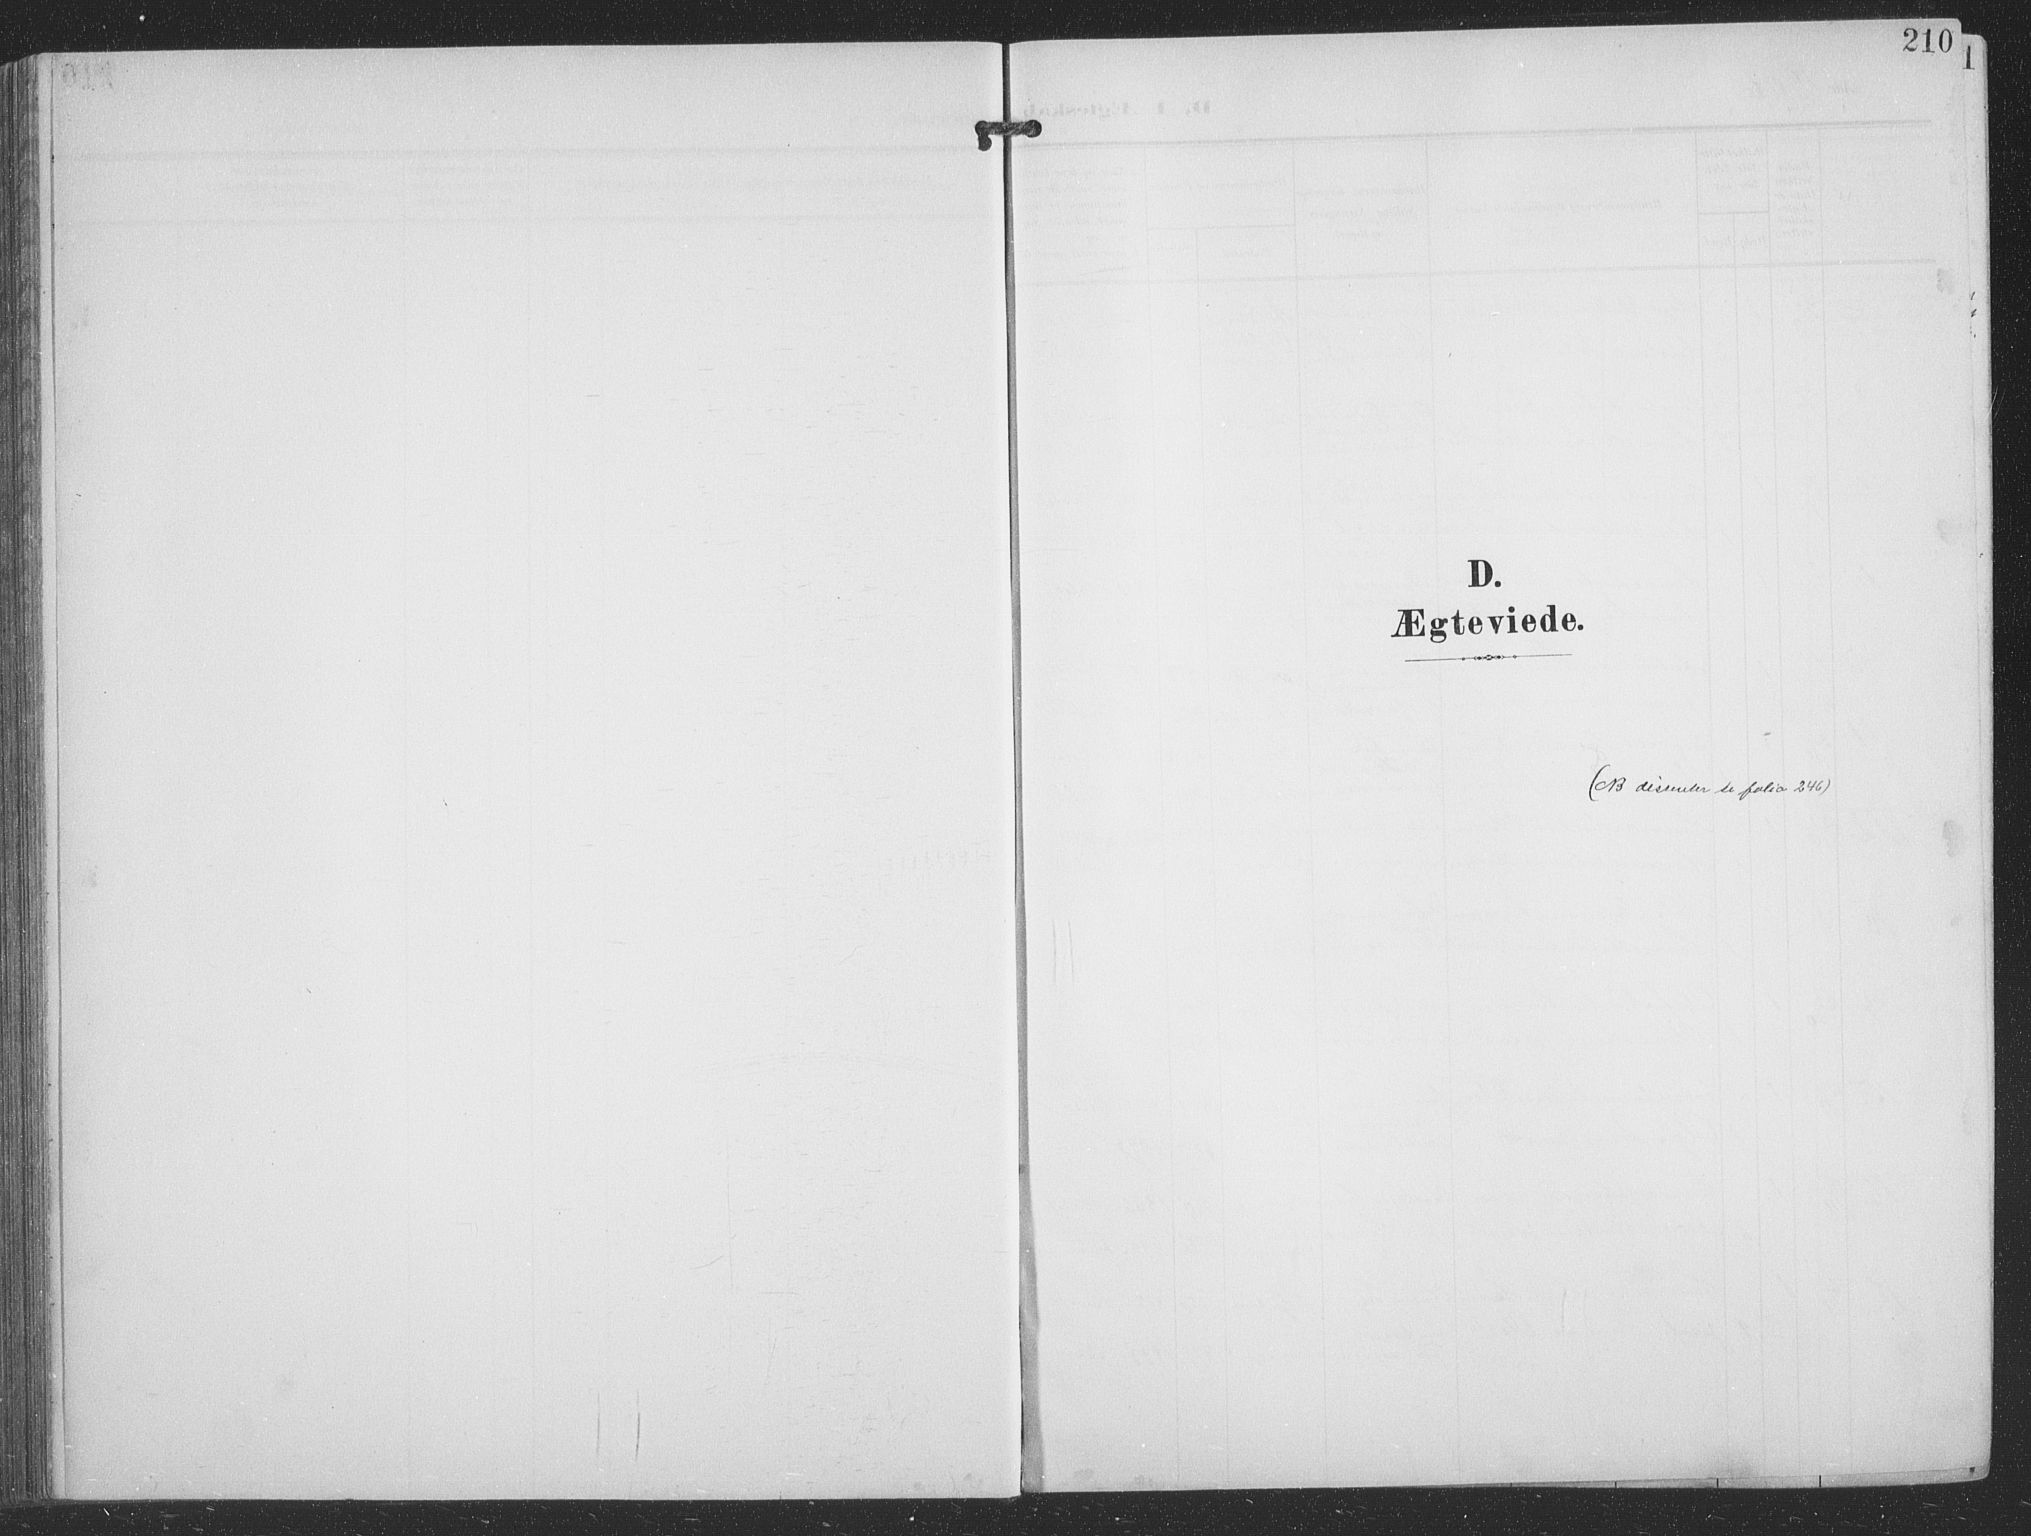 SATØ, Balsfjord sokneprestembete, G/Ga/L0009klokker: Parish register (copy) no. 9, 1906-1920, p. 210